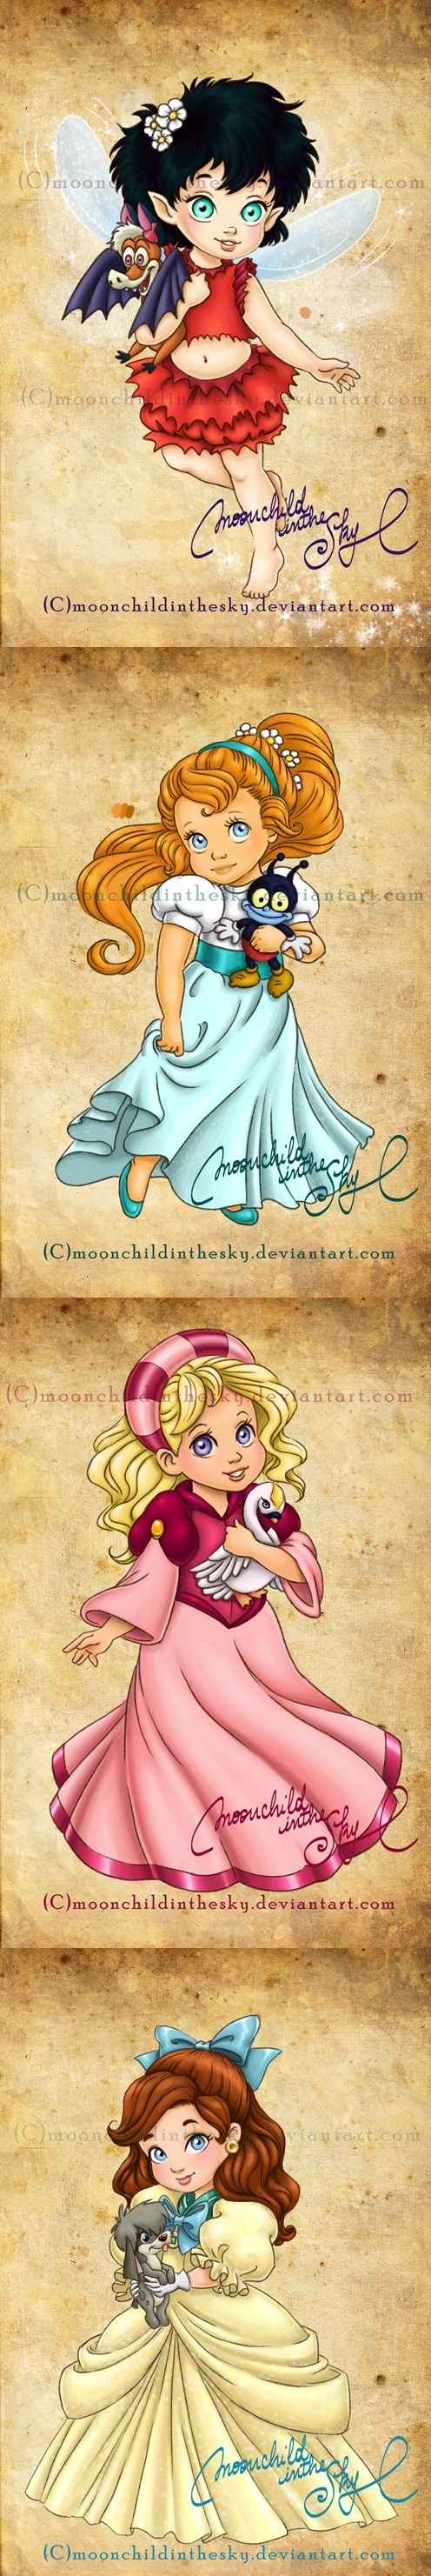 Non-Disney Princesses by moonchildinthesky on deviantart